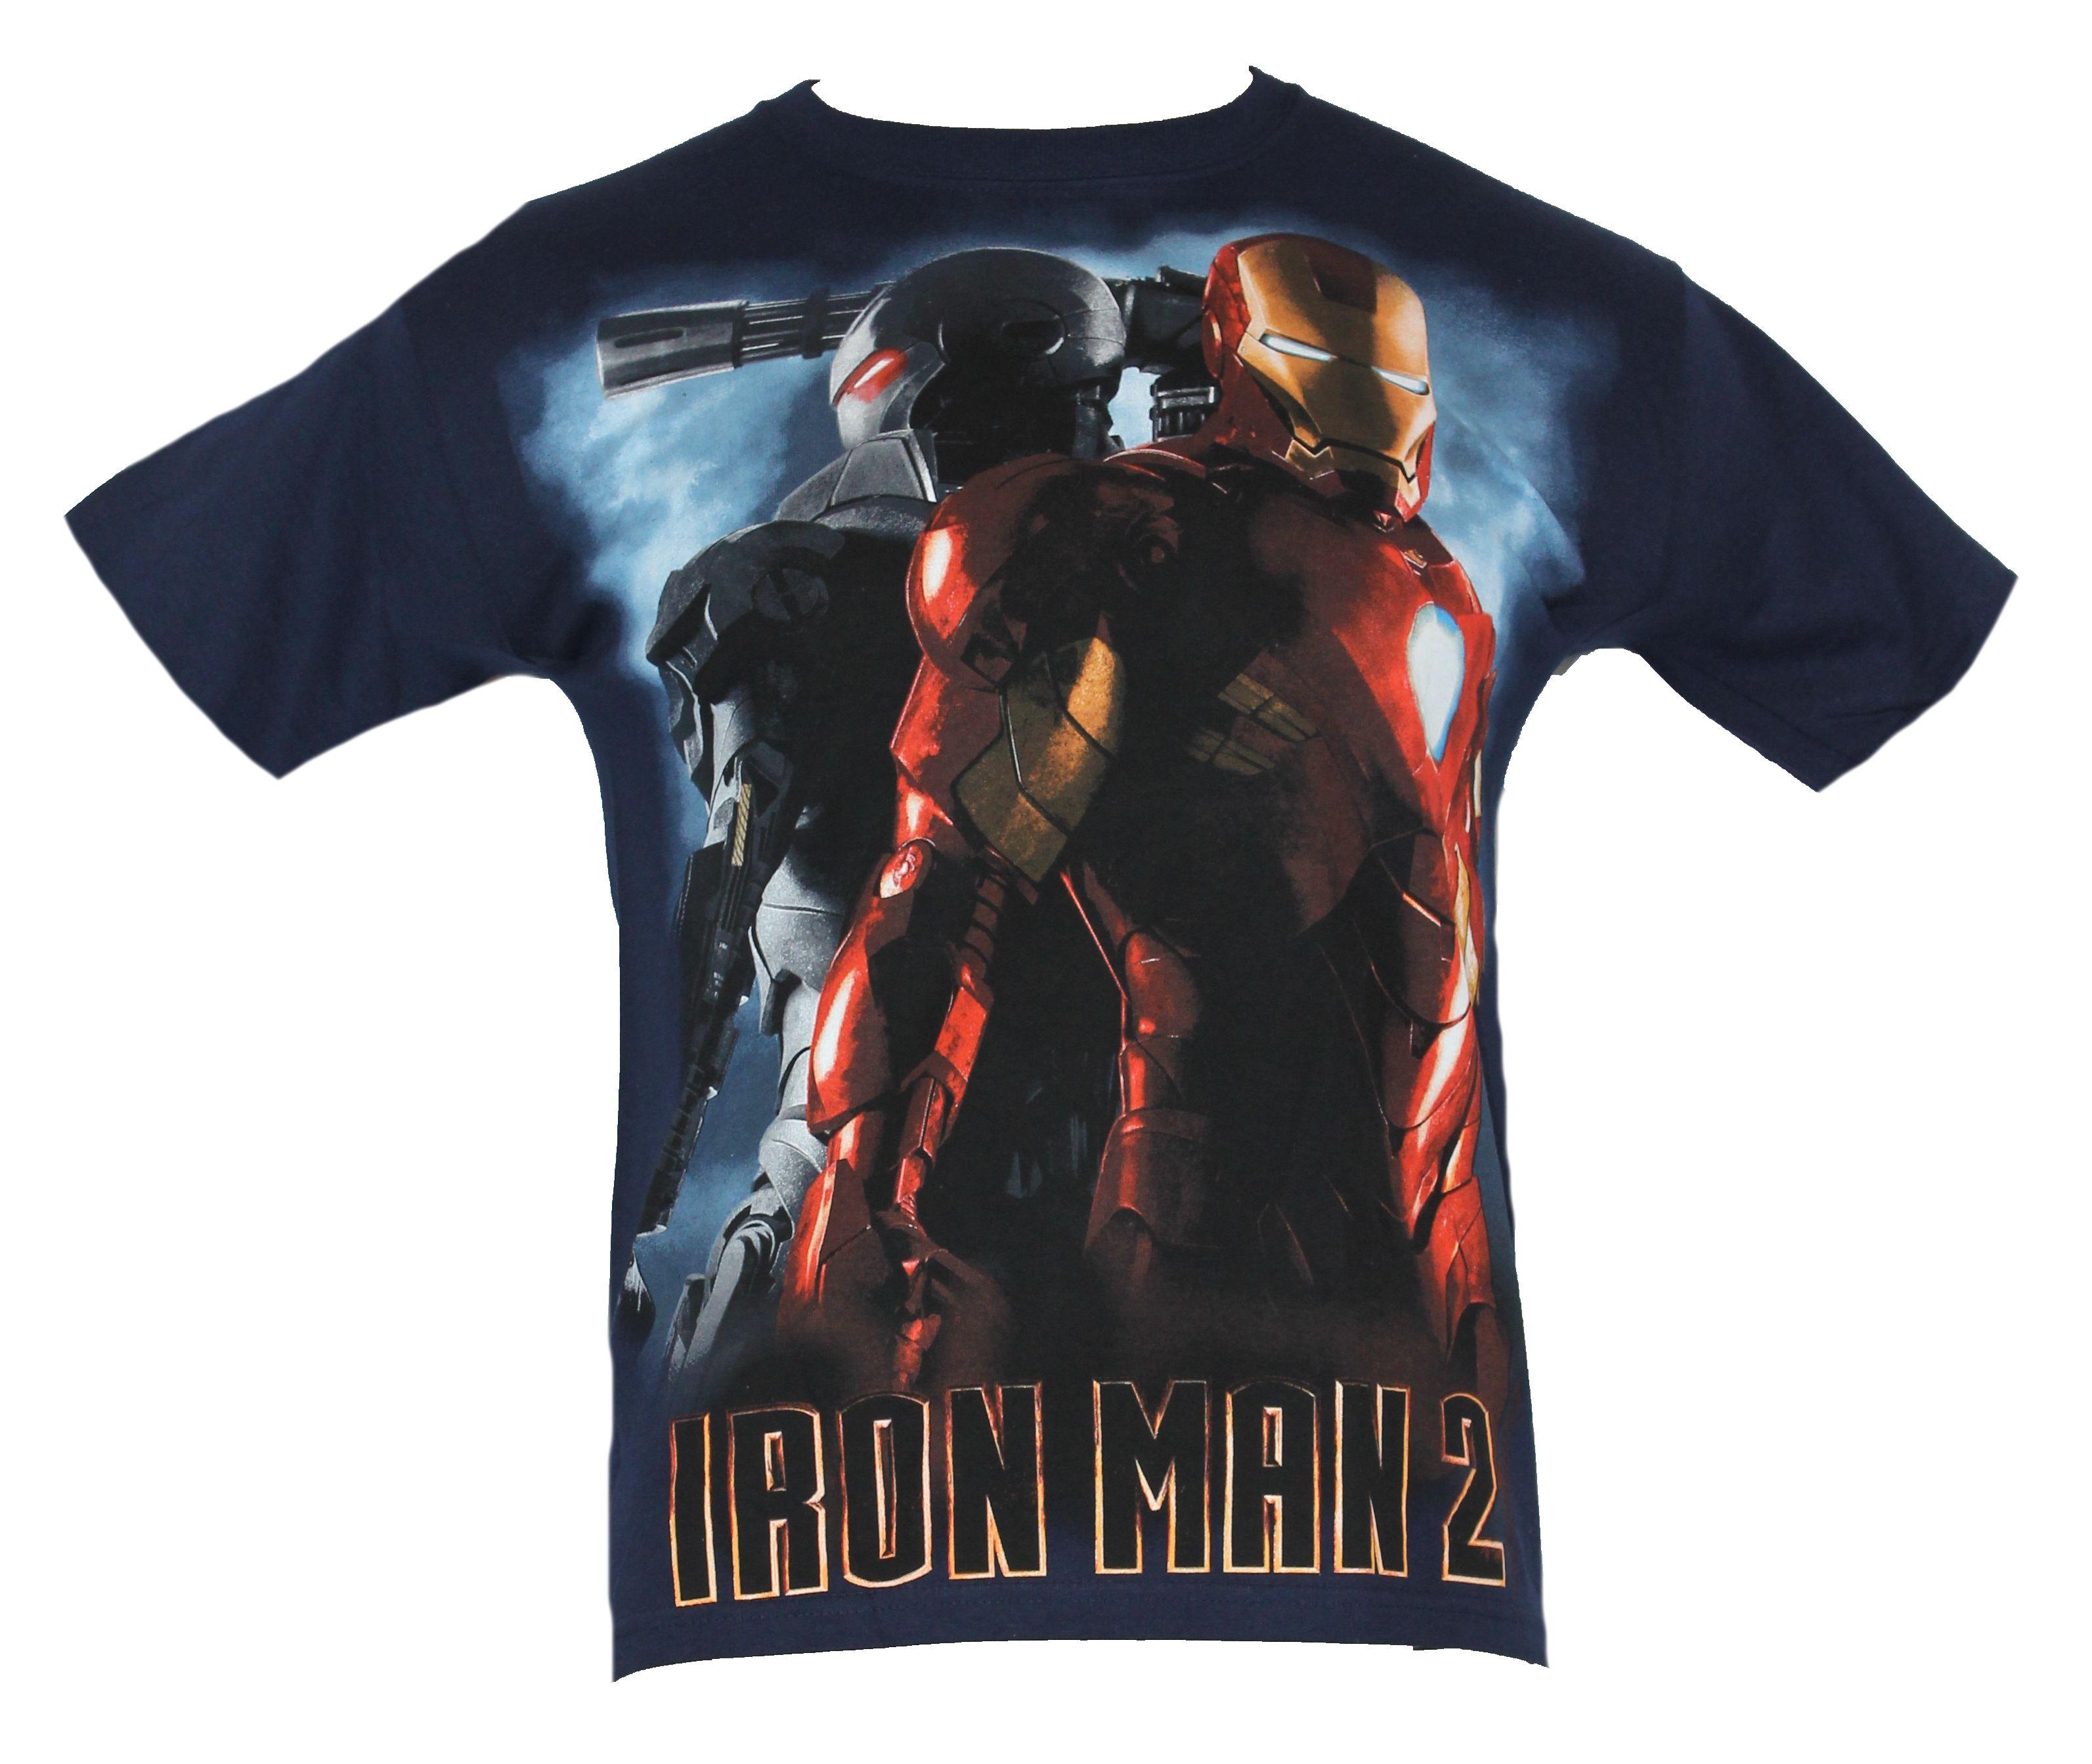 IMPB Iron Man 2 Mens T-Shirt - War Machine Iron Man 2 Back to Back Image on Navy Blue at Sears.com